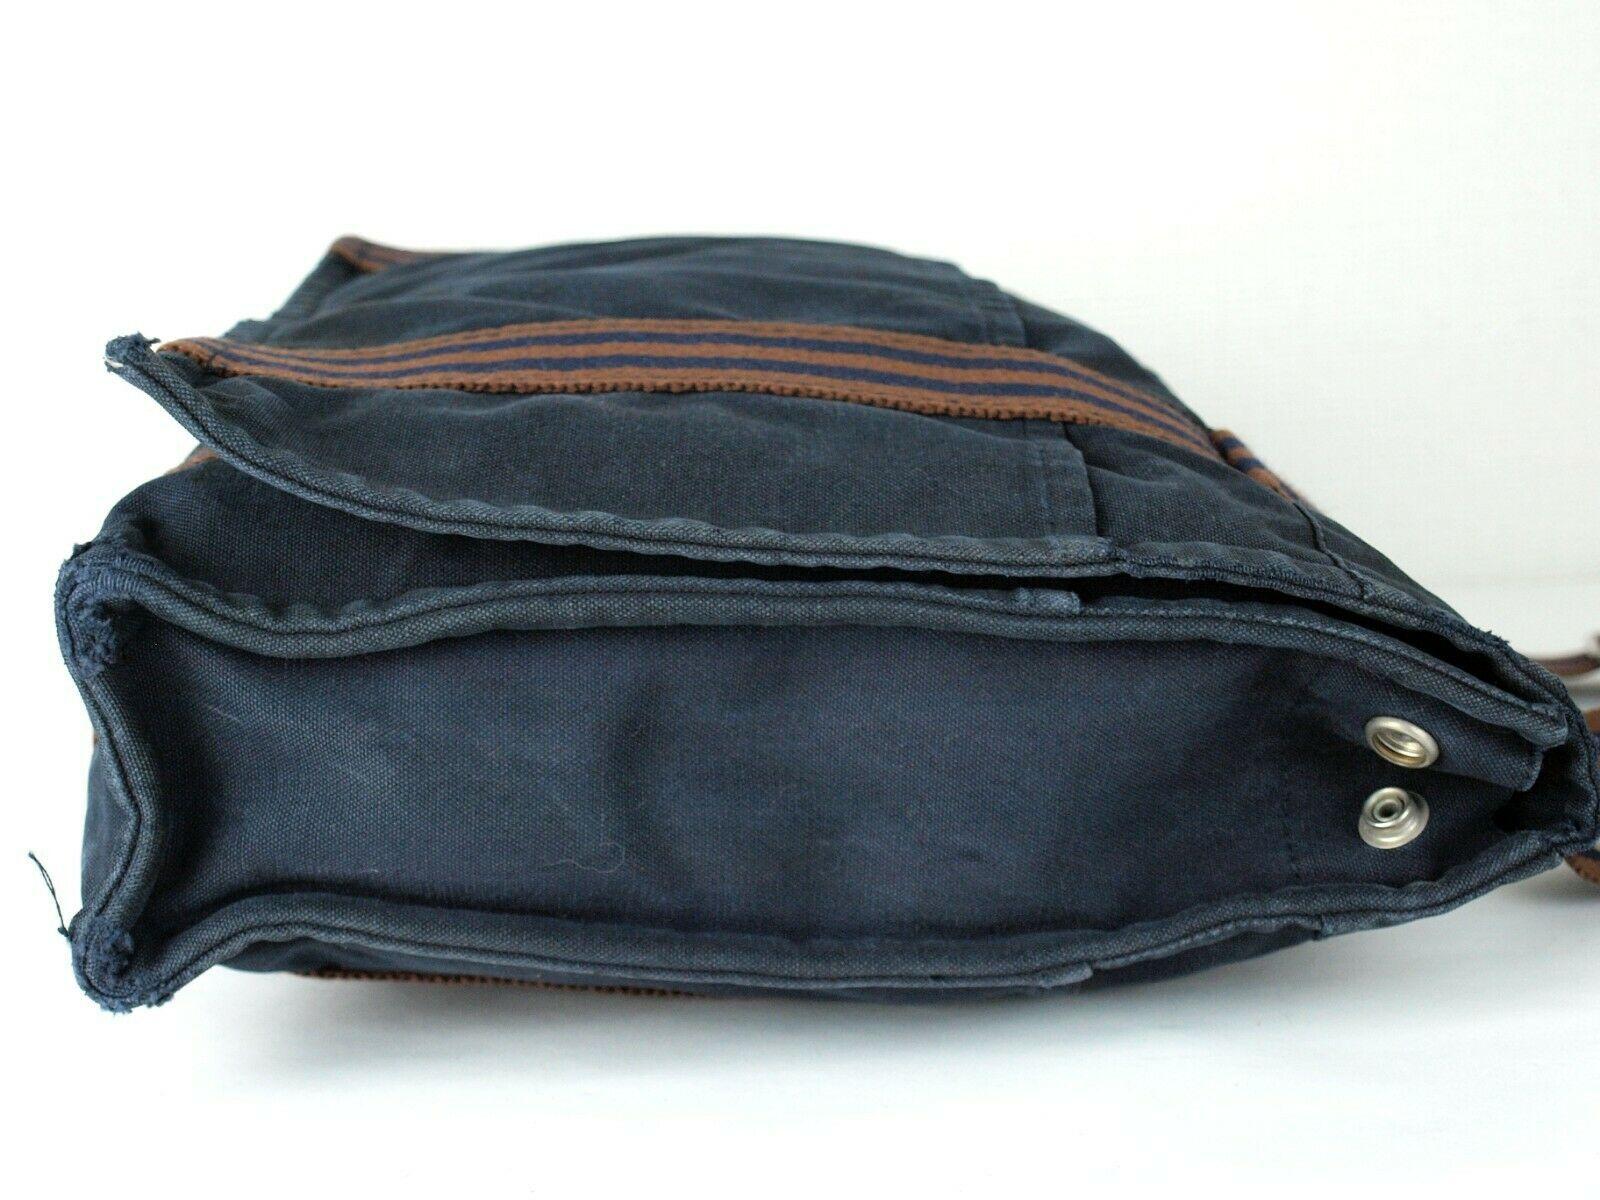 Auth Hermes Fool Toe Vassus MM Navy Cotton Canvas Shoulder Bag Purse France Used image 4